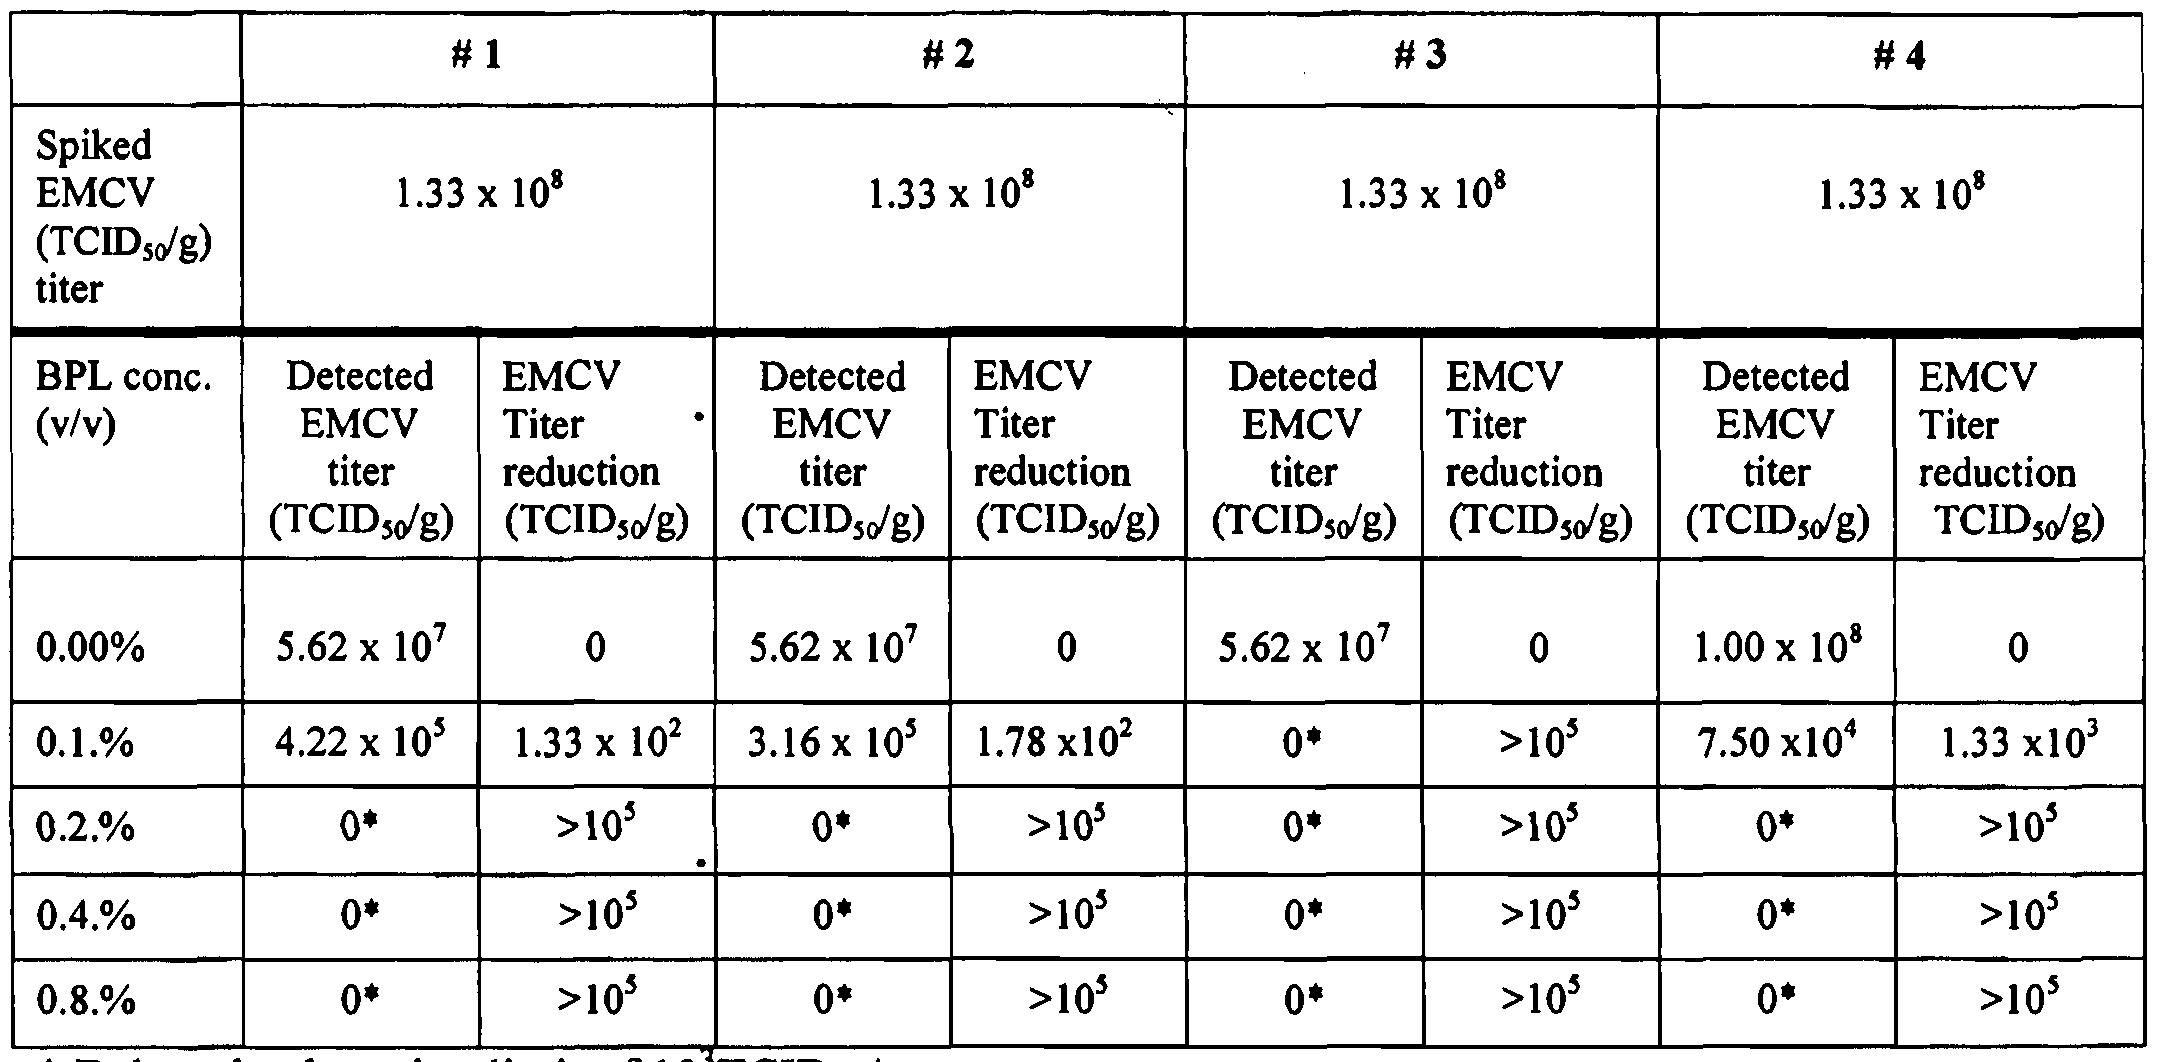 Virology Methods Manual - 1st Edition